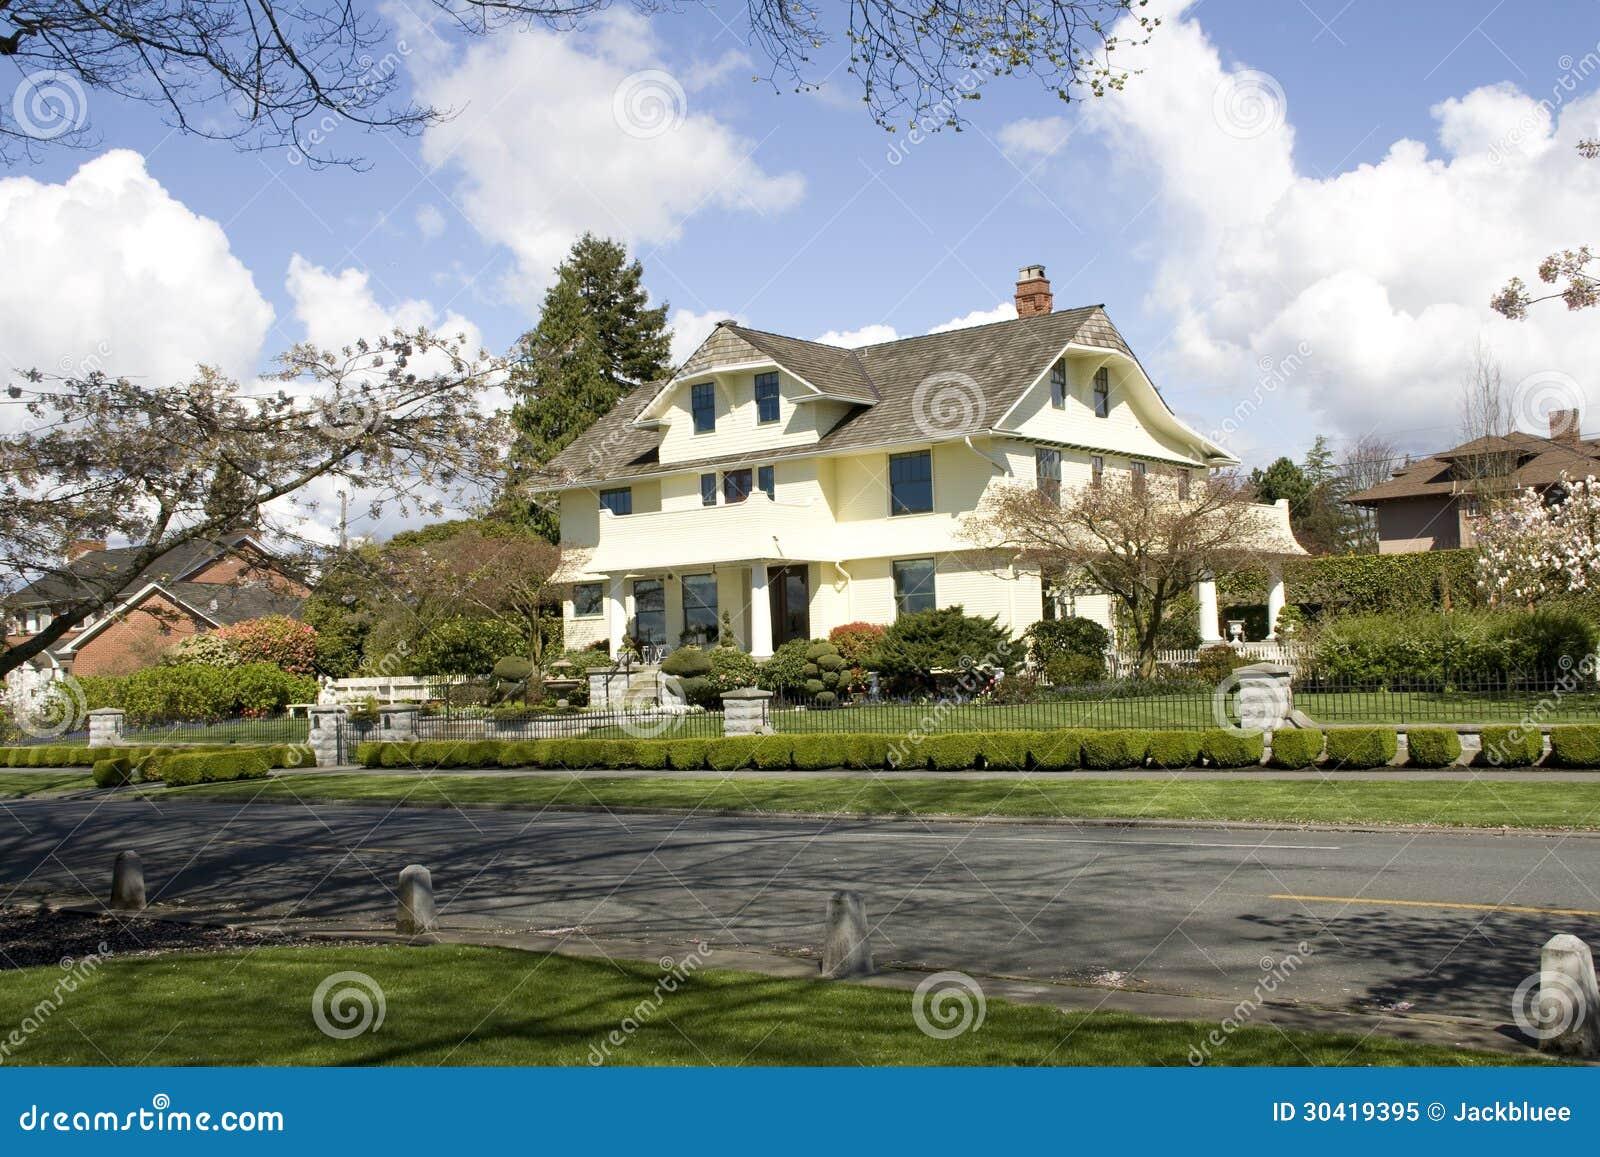 Beautiful houses in a nice neighborhood